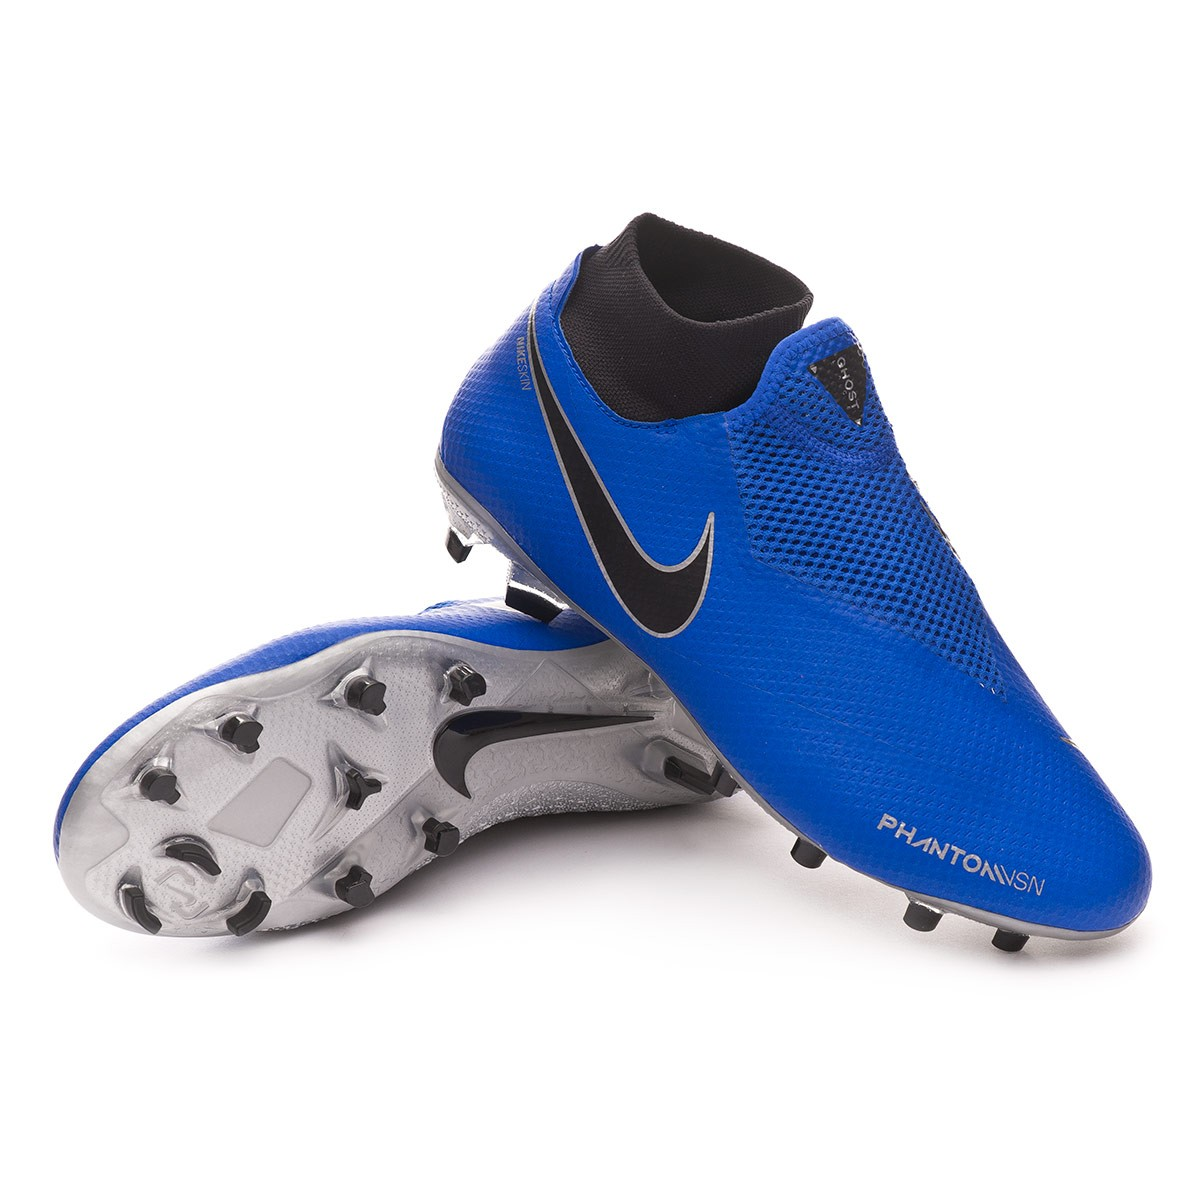 Scarpe Nike Phantom Vision Pro DF FG Racer blue,Black,Metallic silver,Volt  , Negozio di calcio Fútbol Emotion